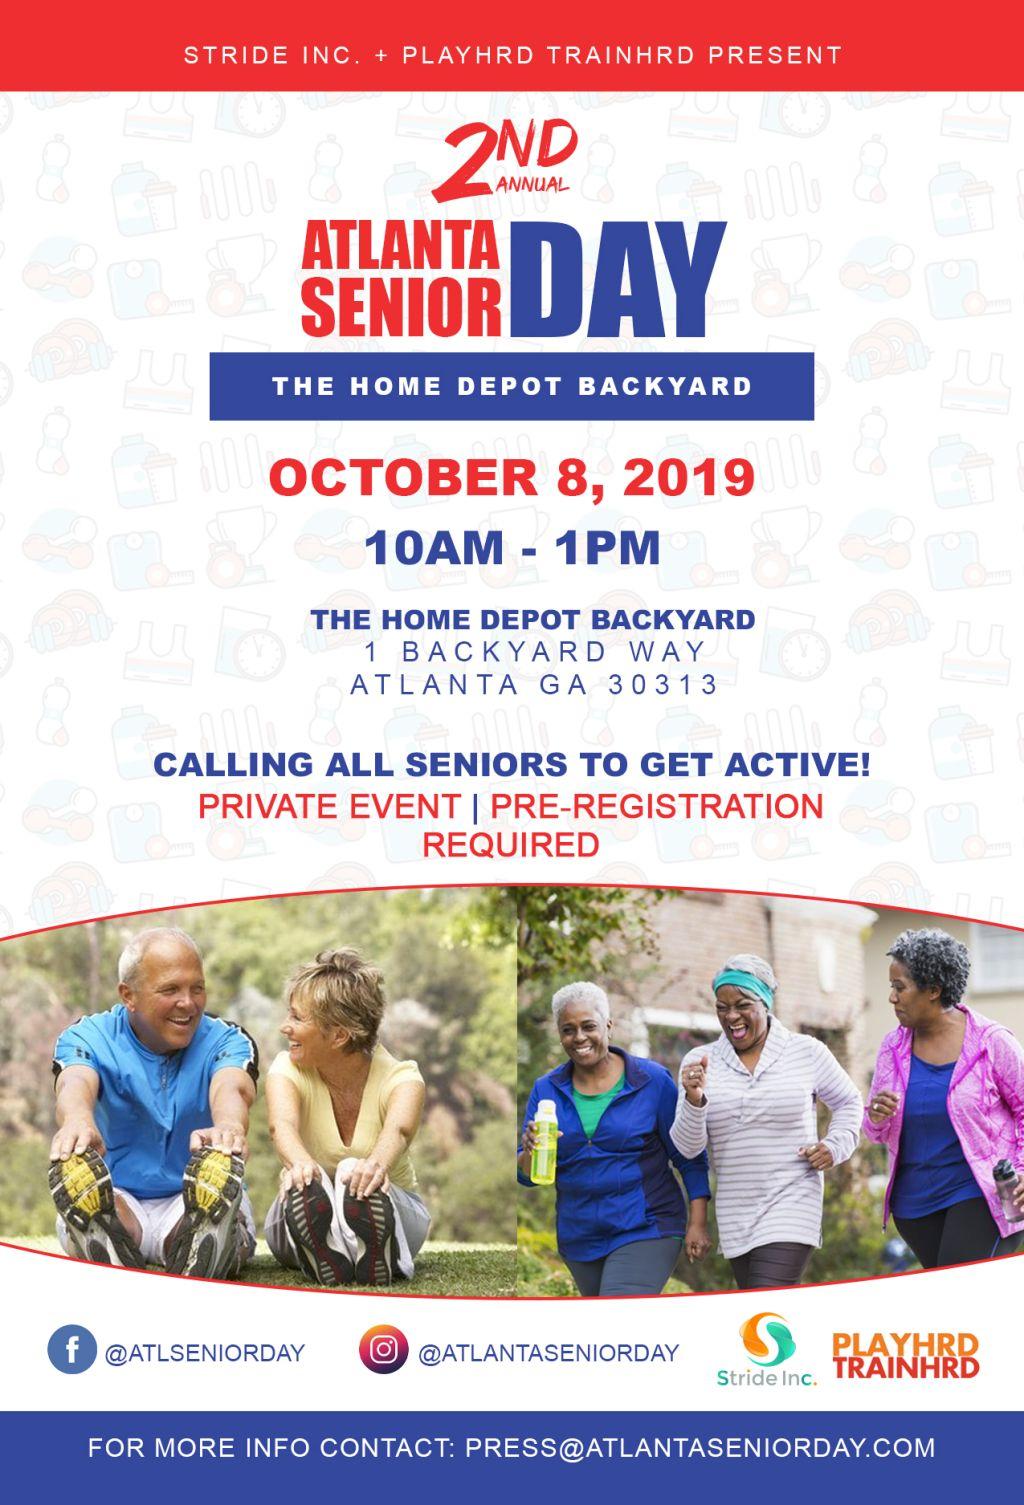 2nd Annual Atlanta Senior Day